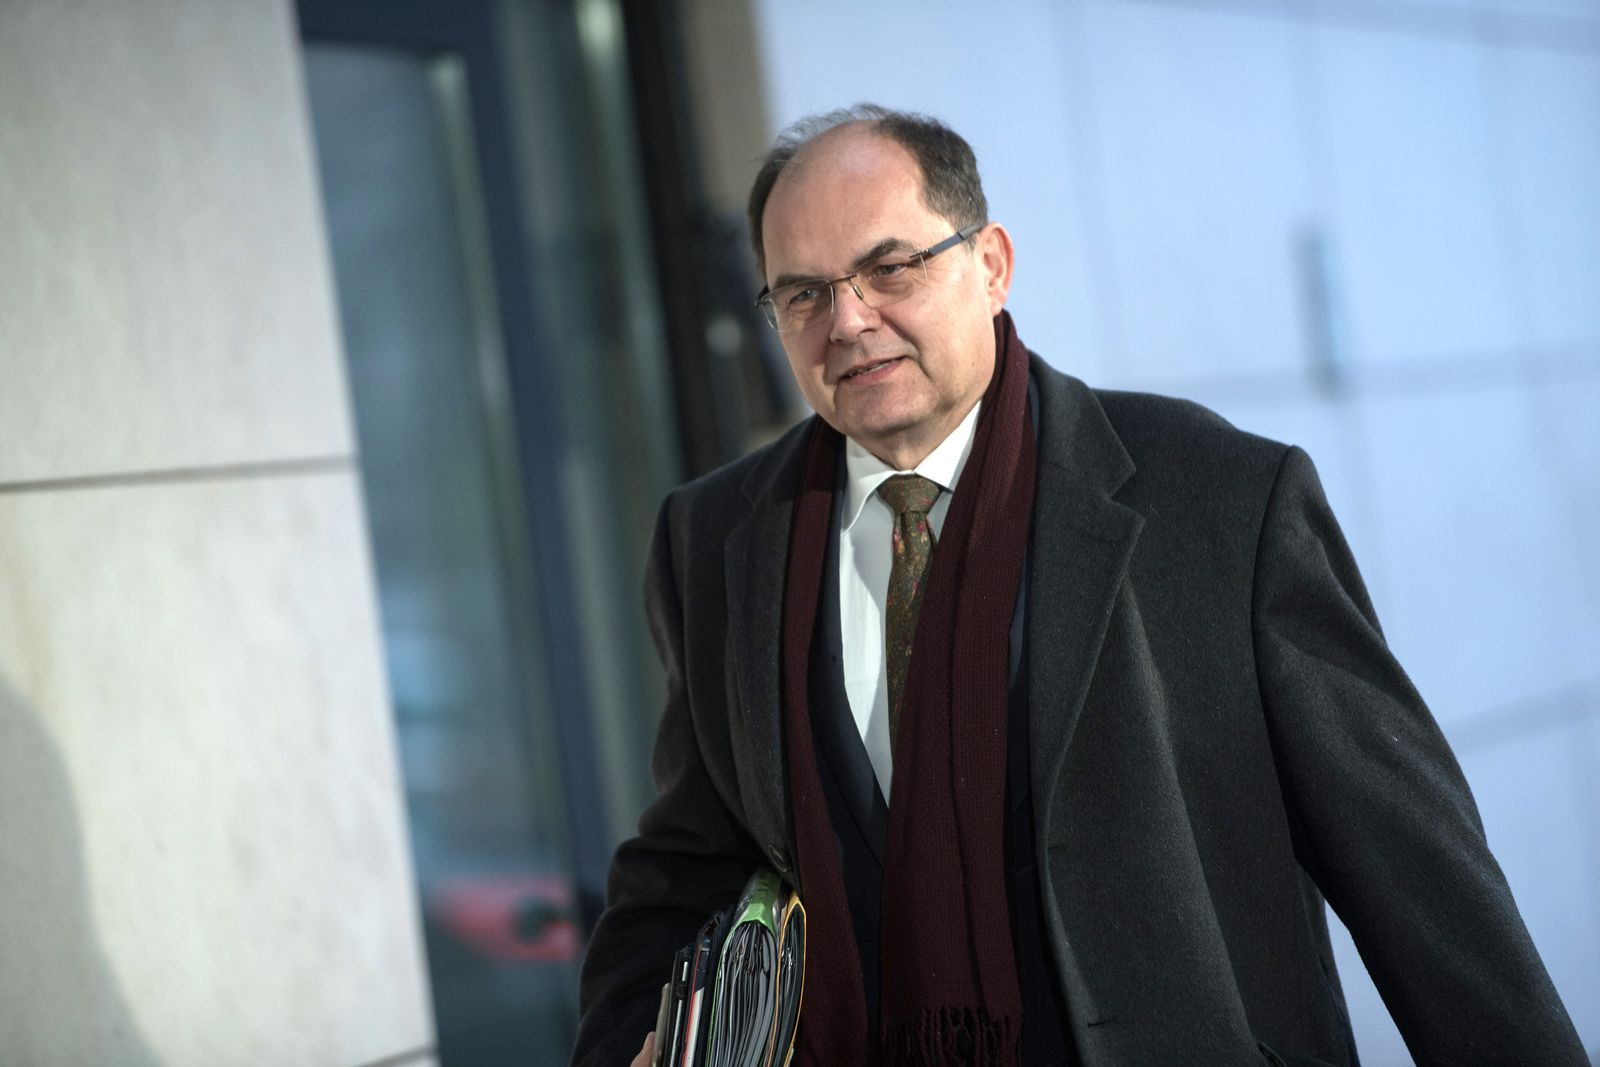 Kabinett Spekulation/ SPD/ Christian Schmidt